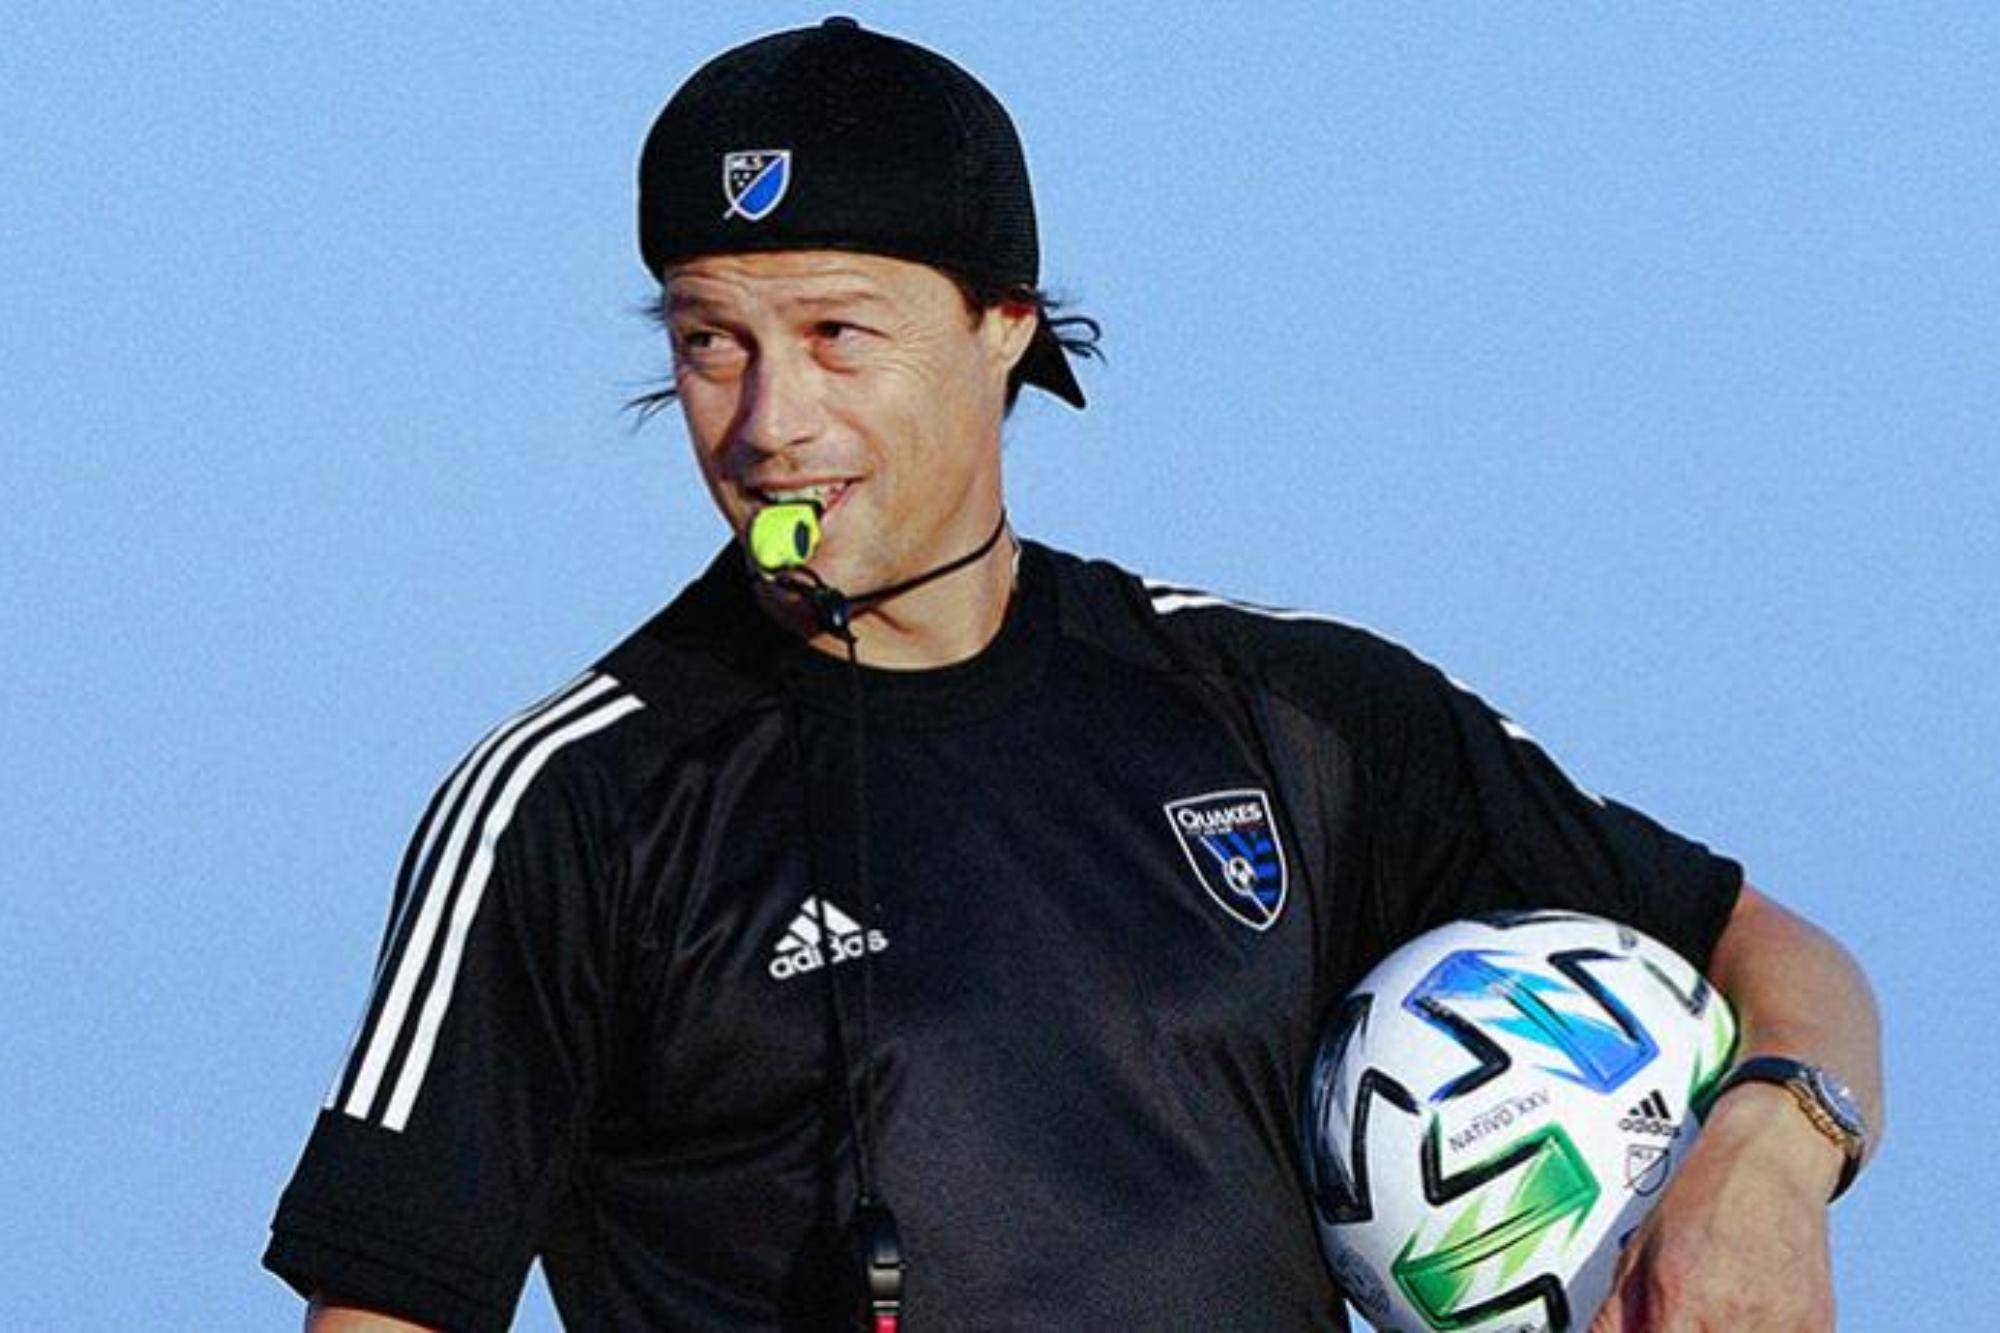 Rompió un récord negativo: San Jose Earthquakes de Almeyda volvió a ser goleado en la MLS